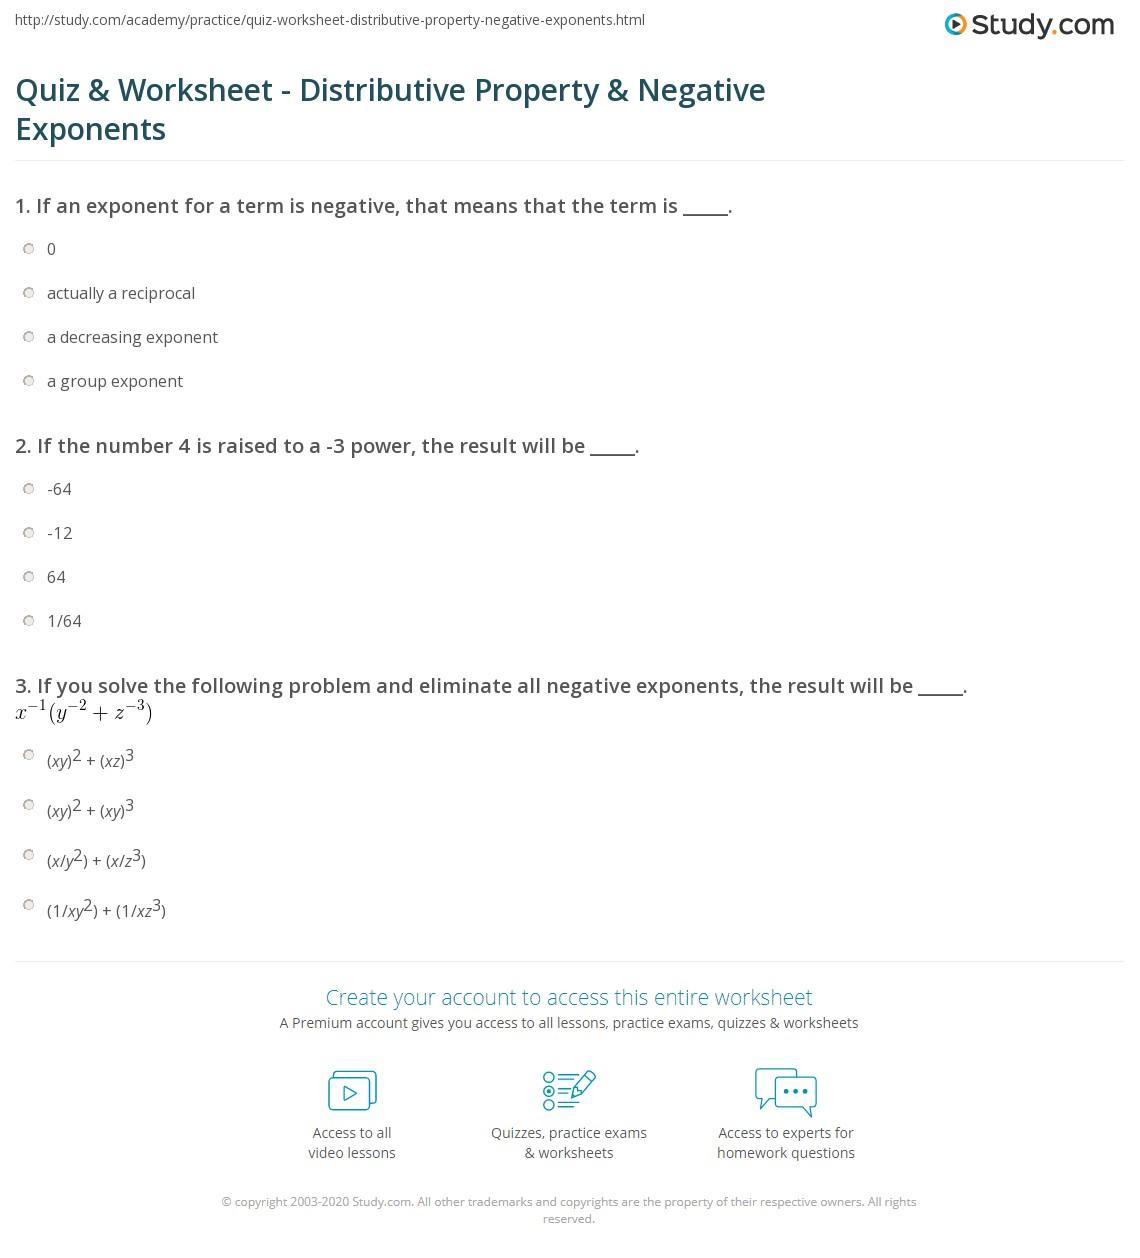 Distributive property worksheet answer key